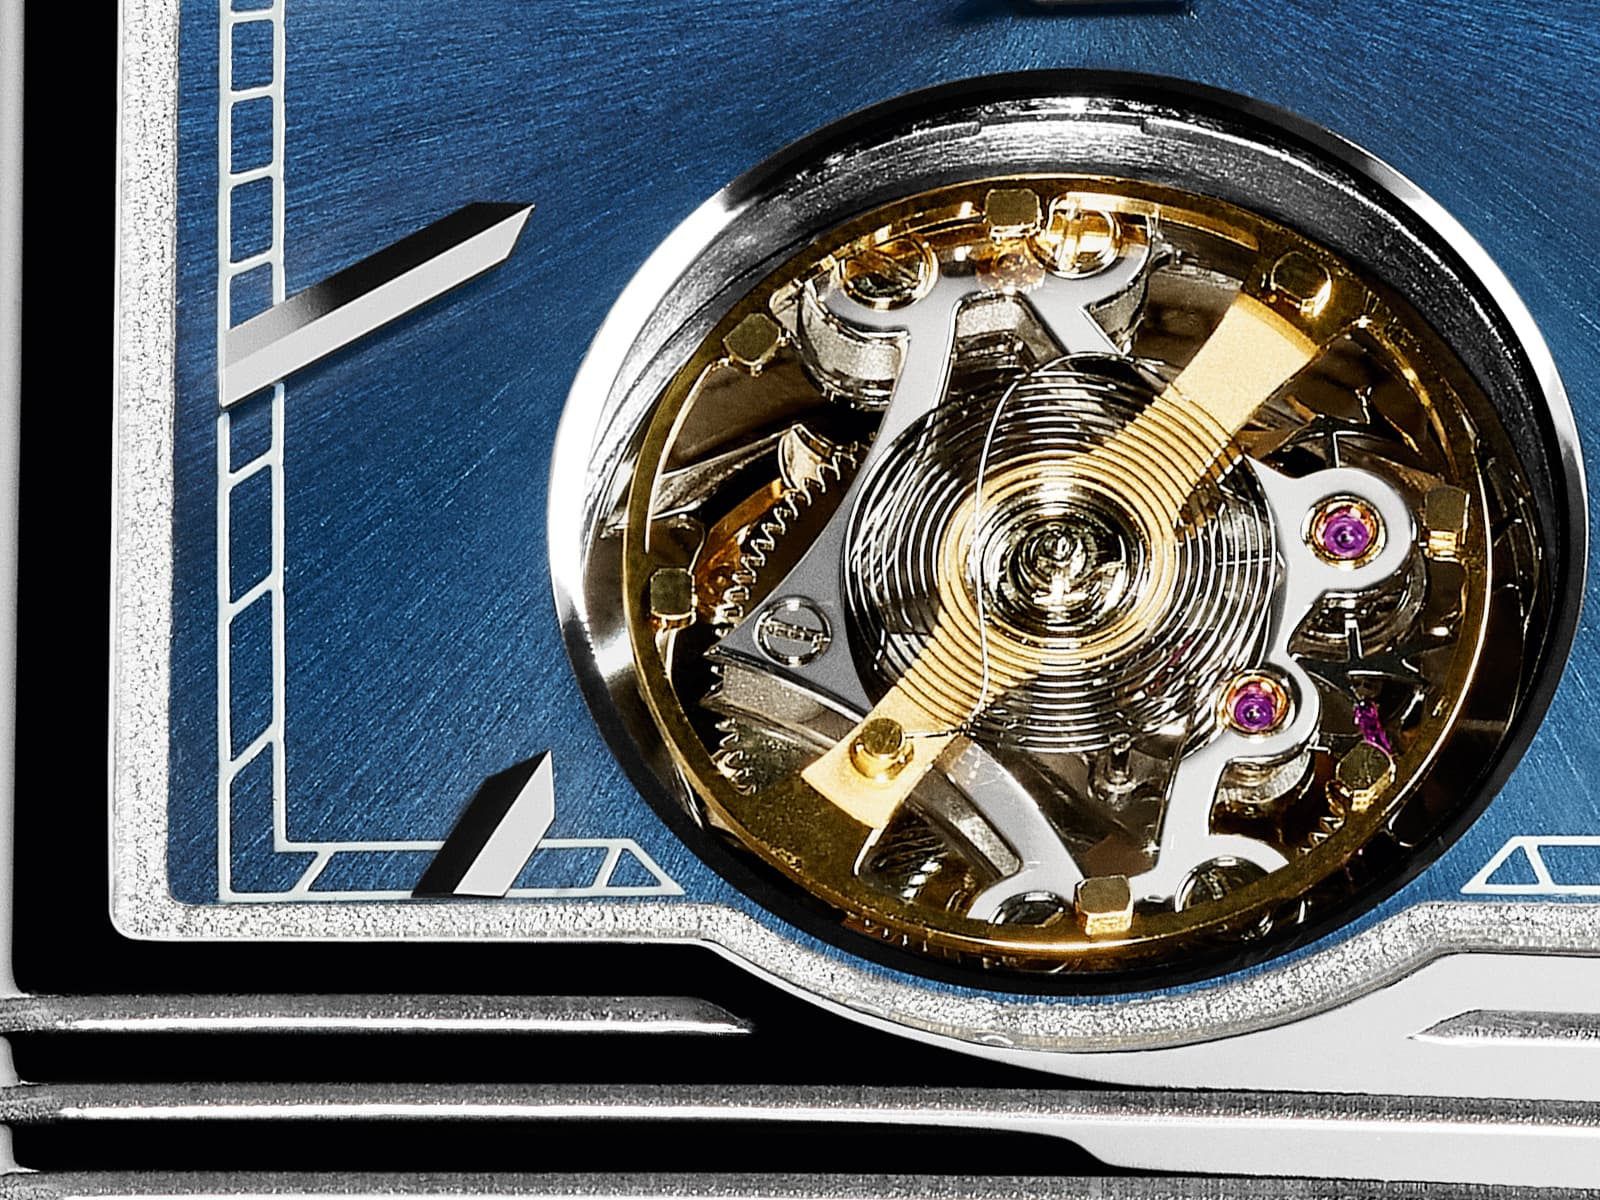 q3926480-jaeger-lecoultre-reverso-tribute-tourbillon-duoface-platinum-5-.jpg